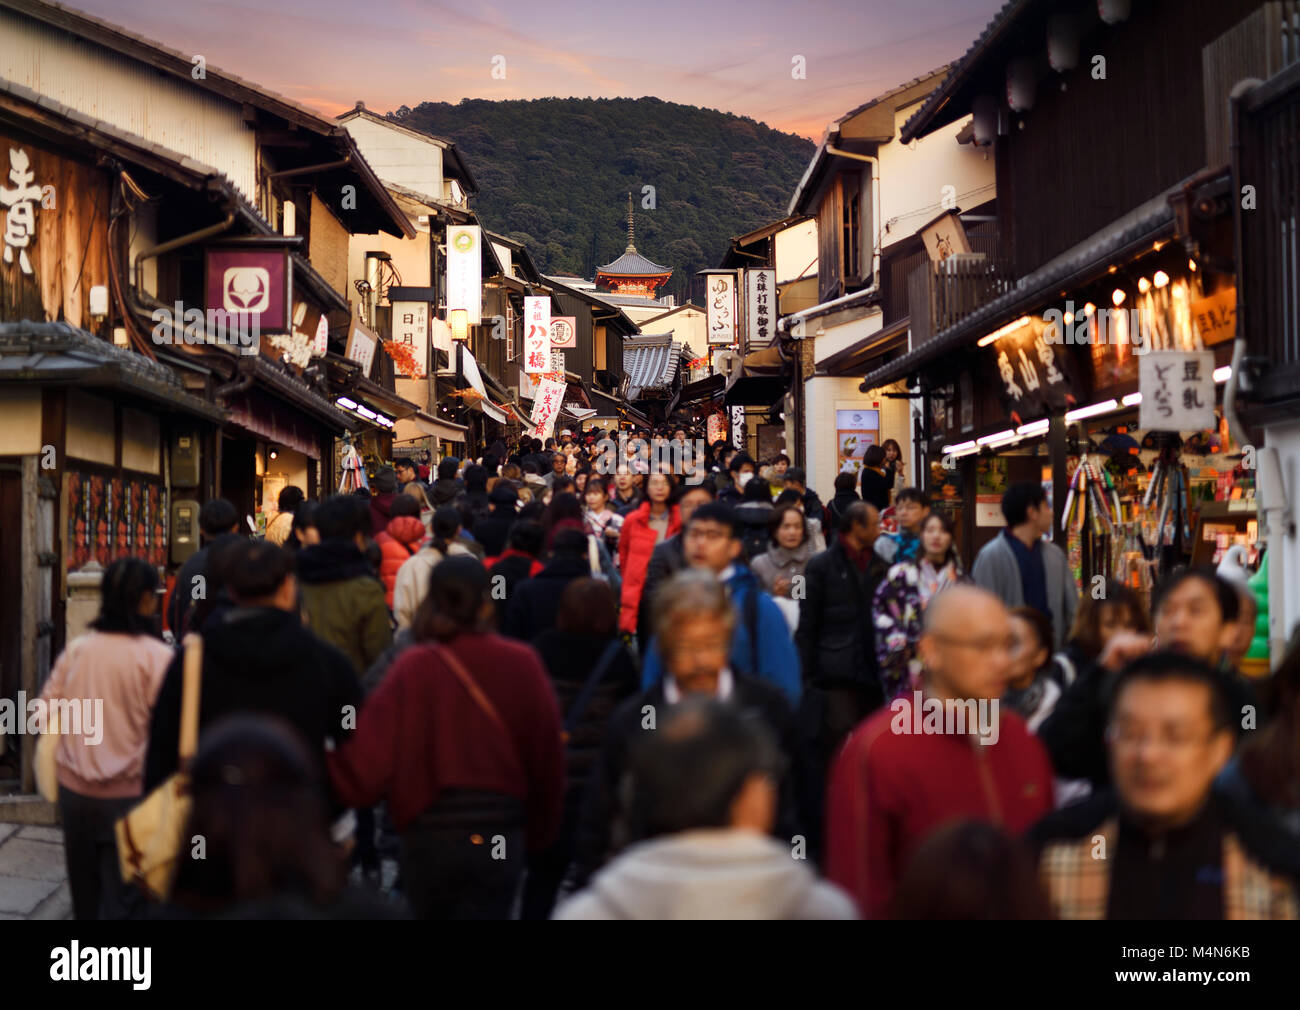 Matsubara dori street al tramonto in autunno affollata di turisti nei pressi di Kiyomizu-dera tempio. Higashiyama, Immagini Stock